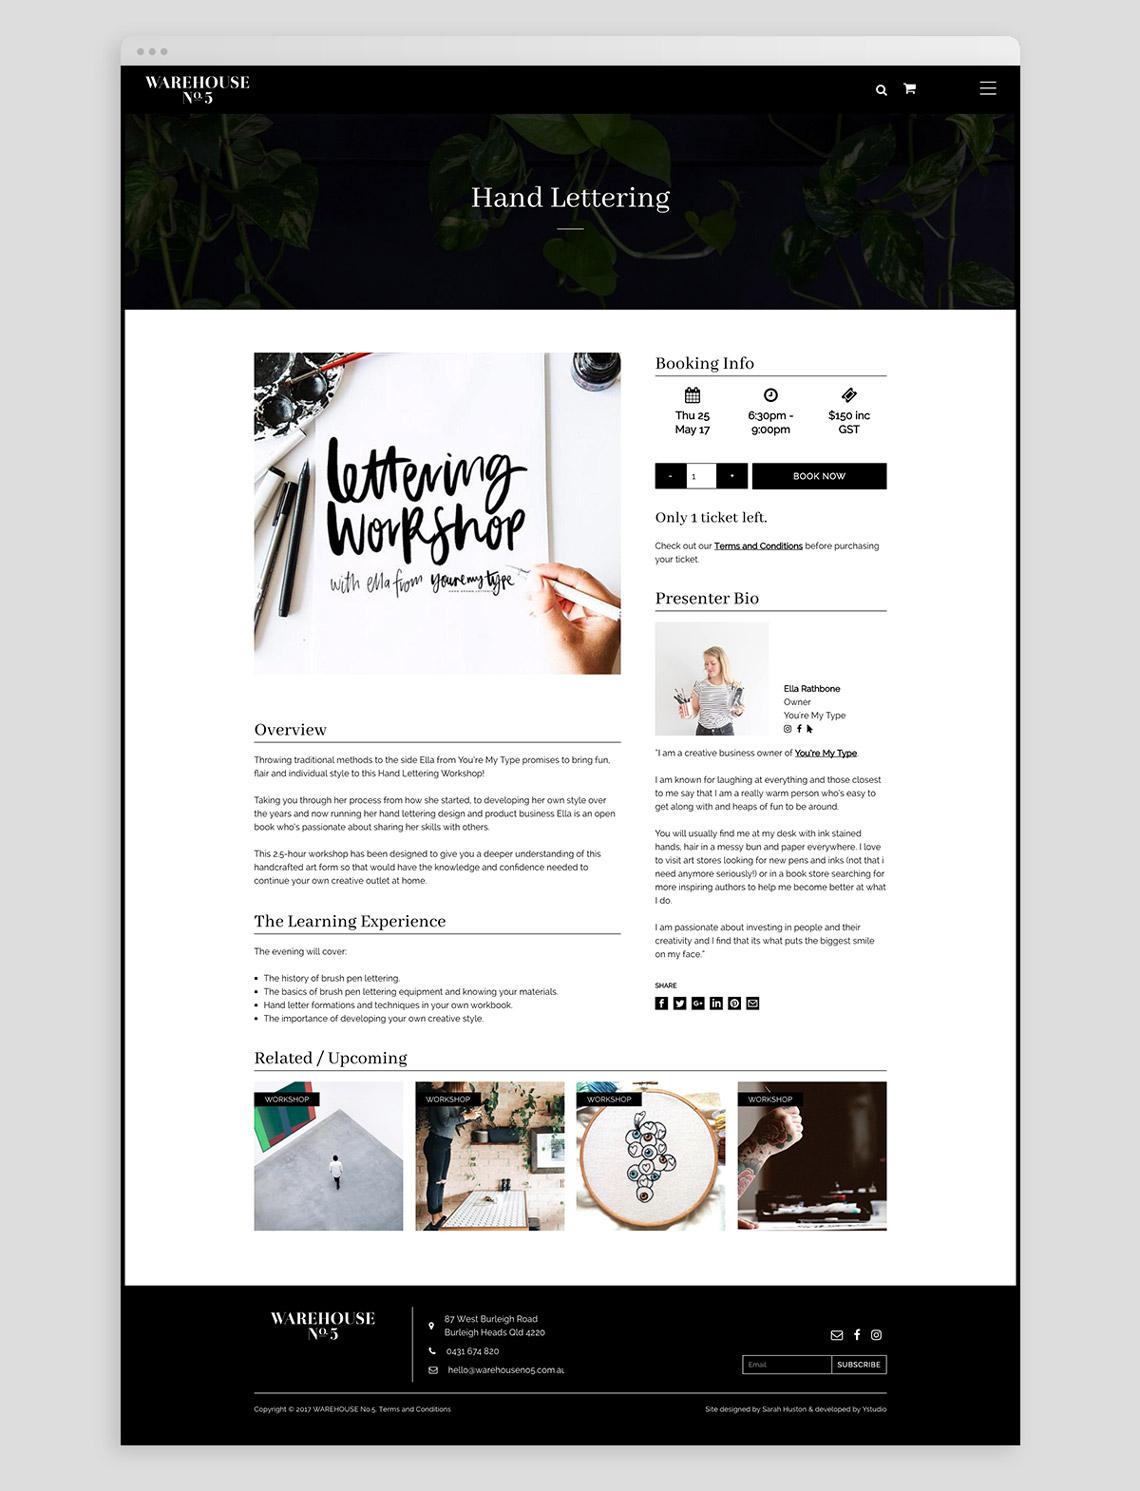 Warehouse No.5 workshop page